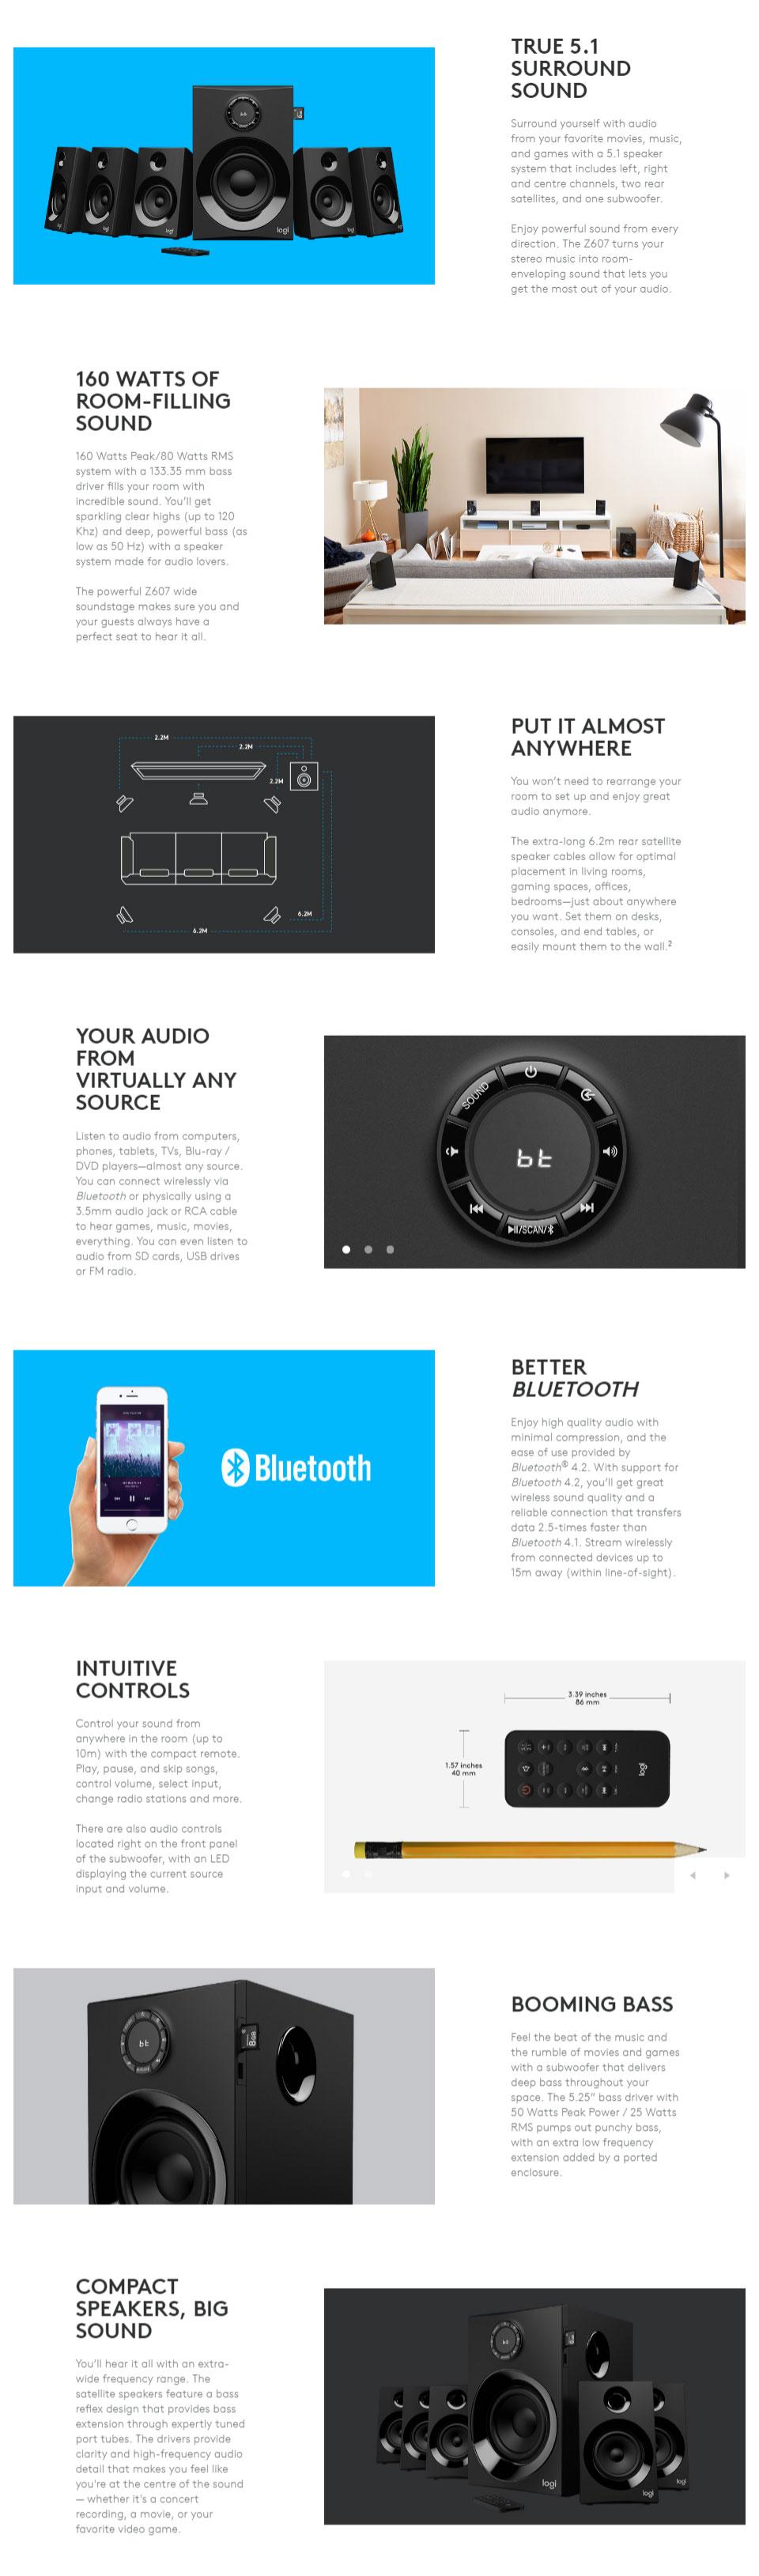 ba0f73a3a44 Logitech Z607 5.1 Surround Sound Speaker System with Bluetooth 980-001318